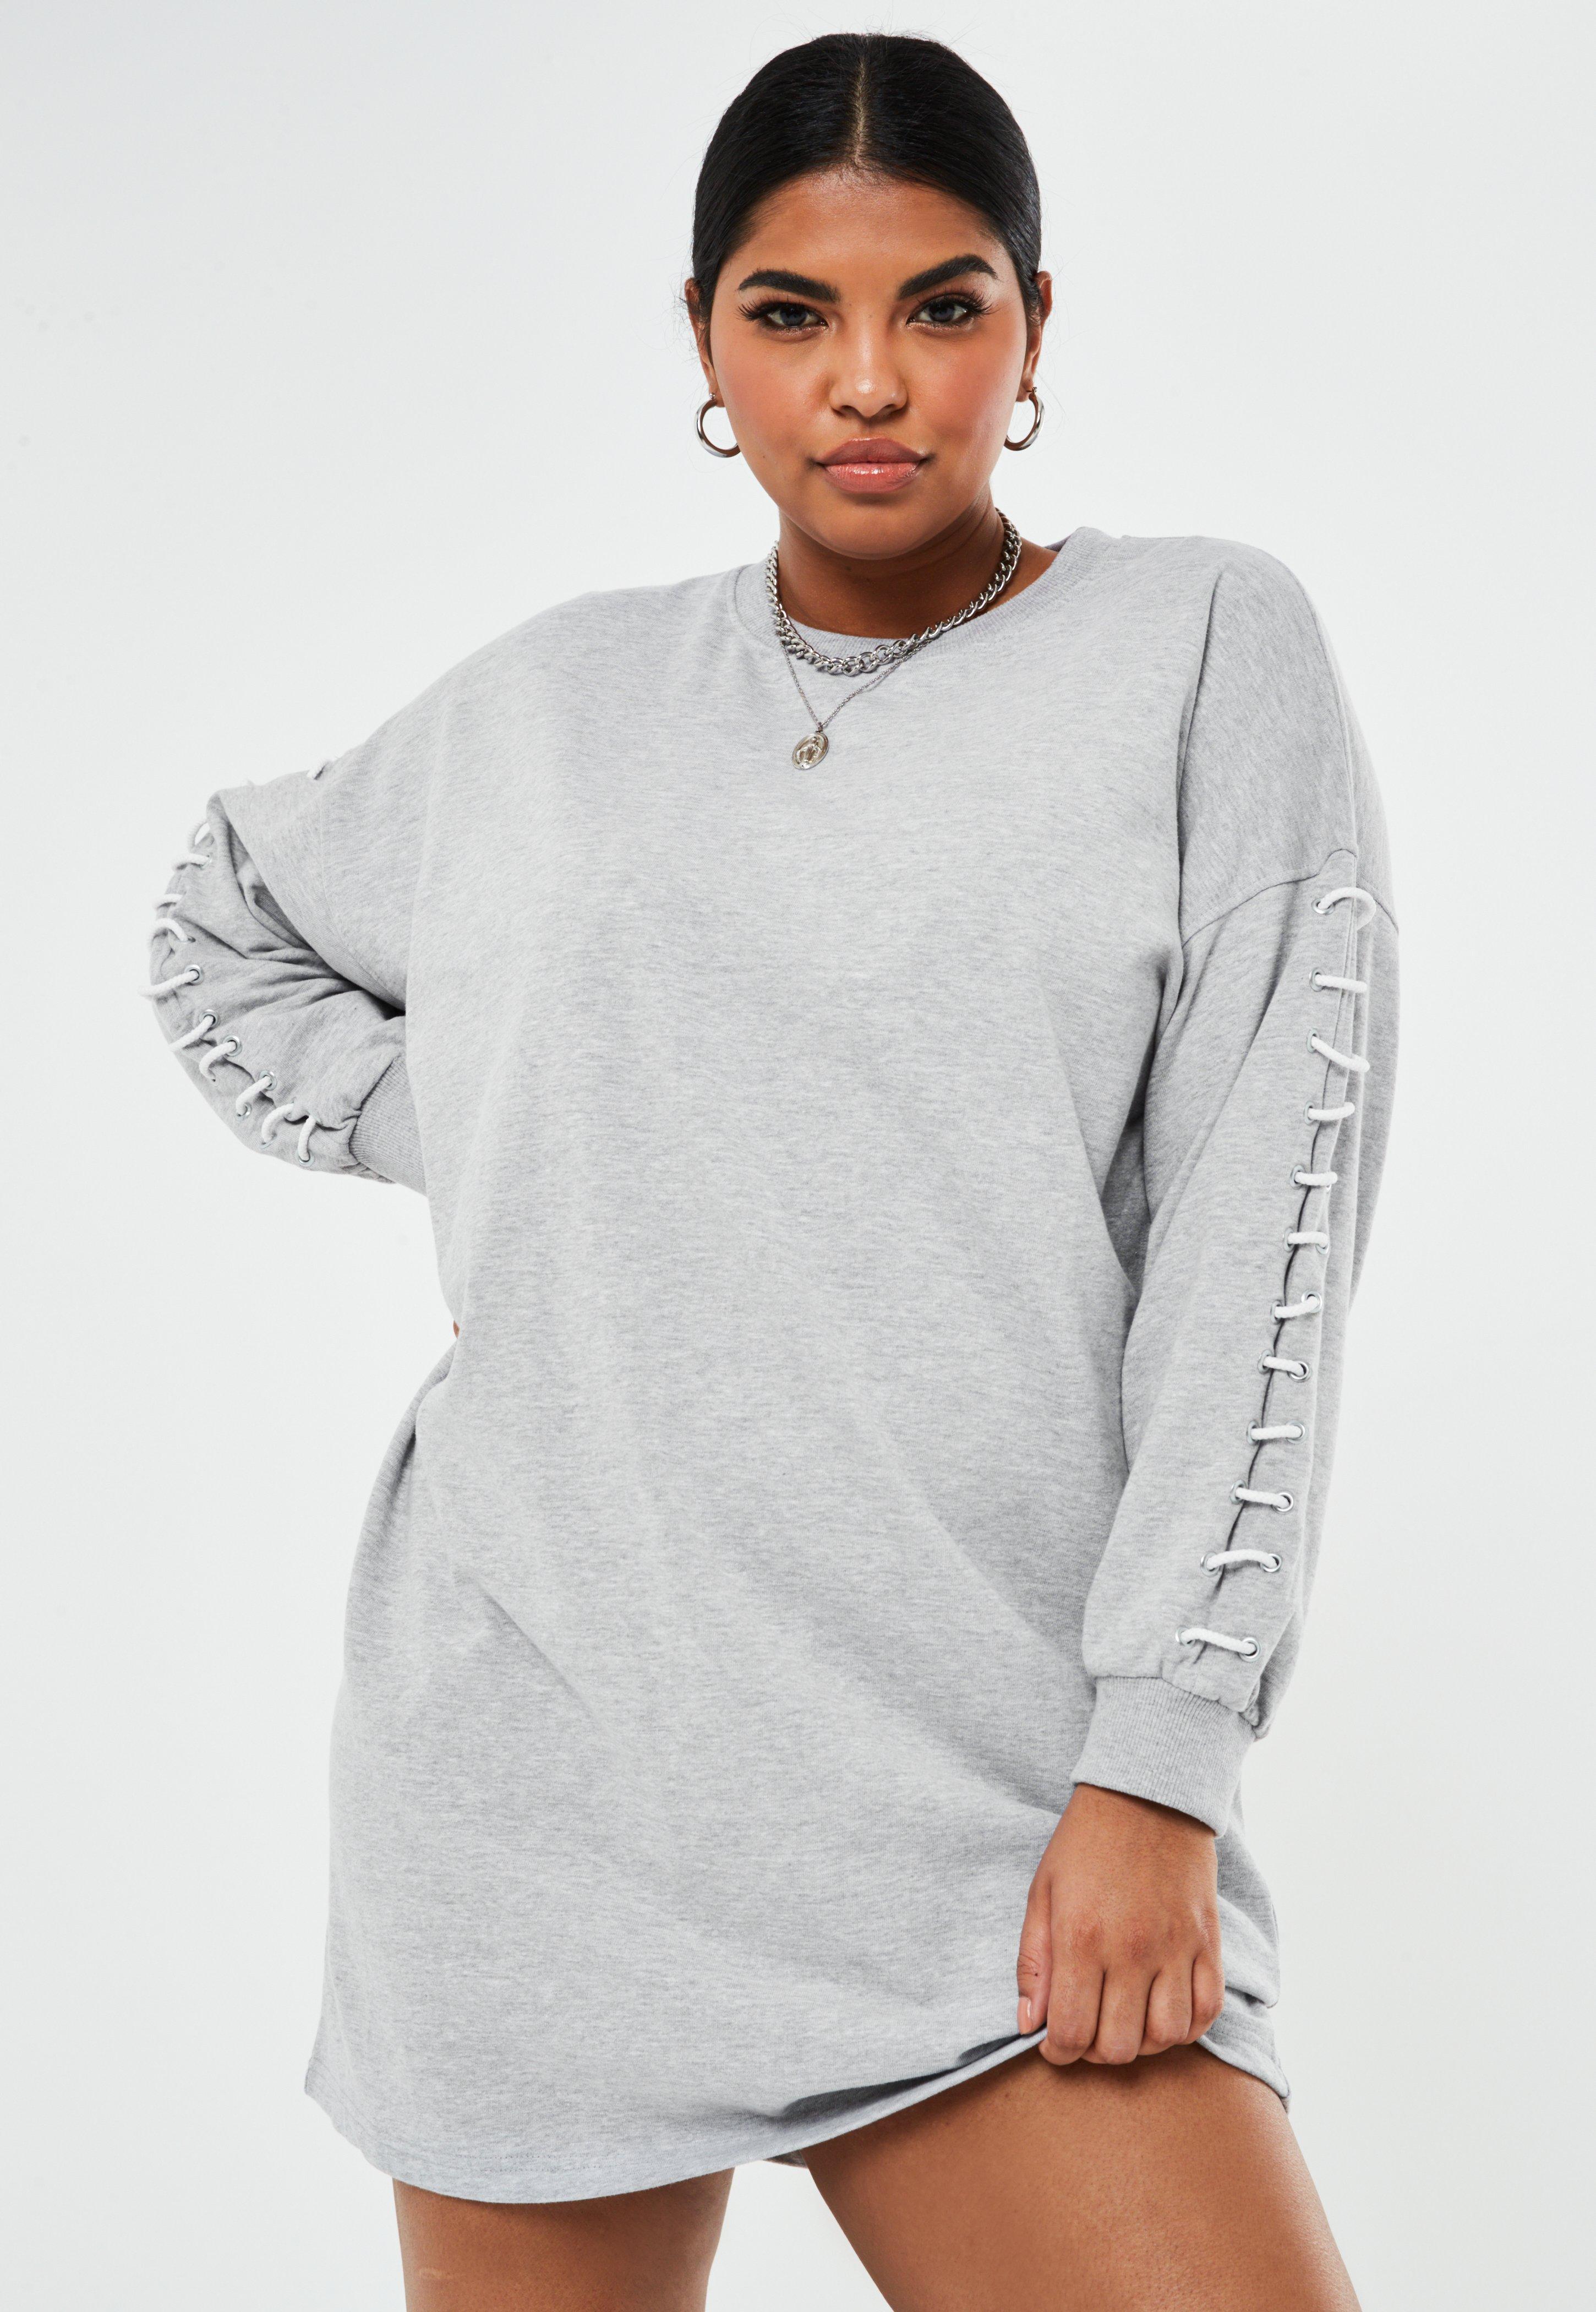 Robe sweat grise avec manches cordon grandes tailles